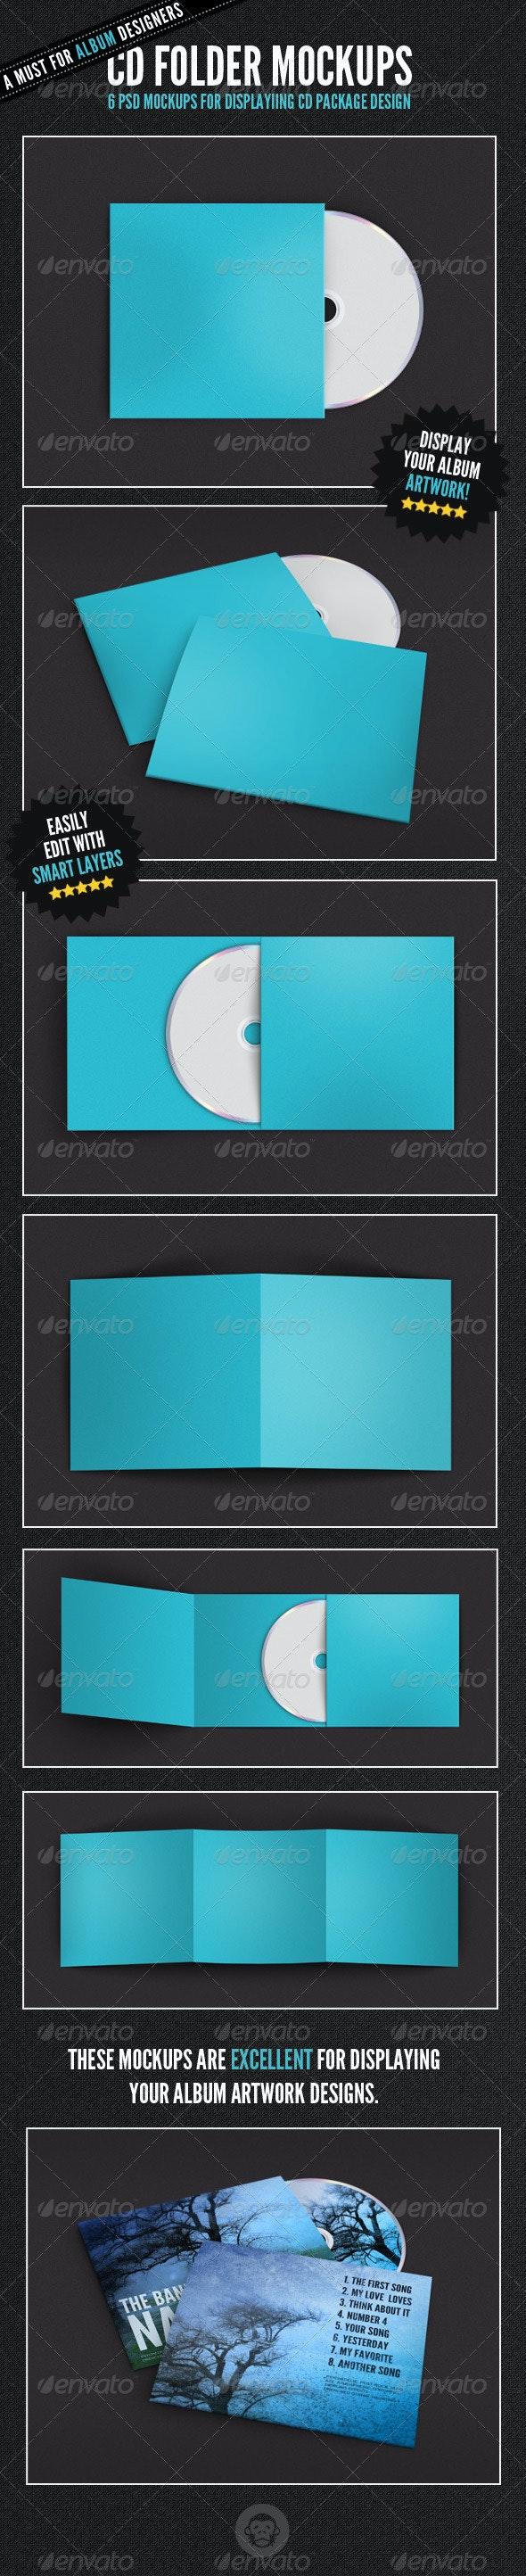 Album Cover - CD Folder Mockups - Discs Packaging